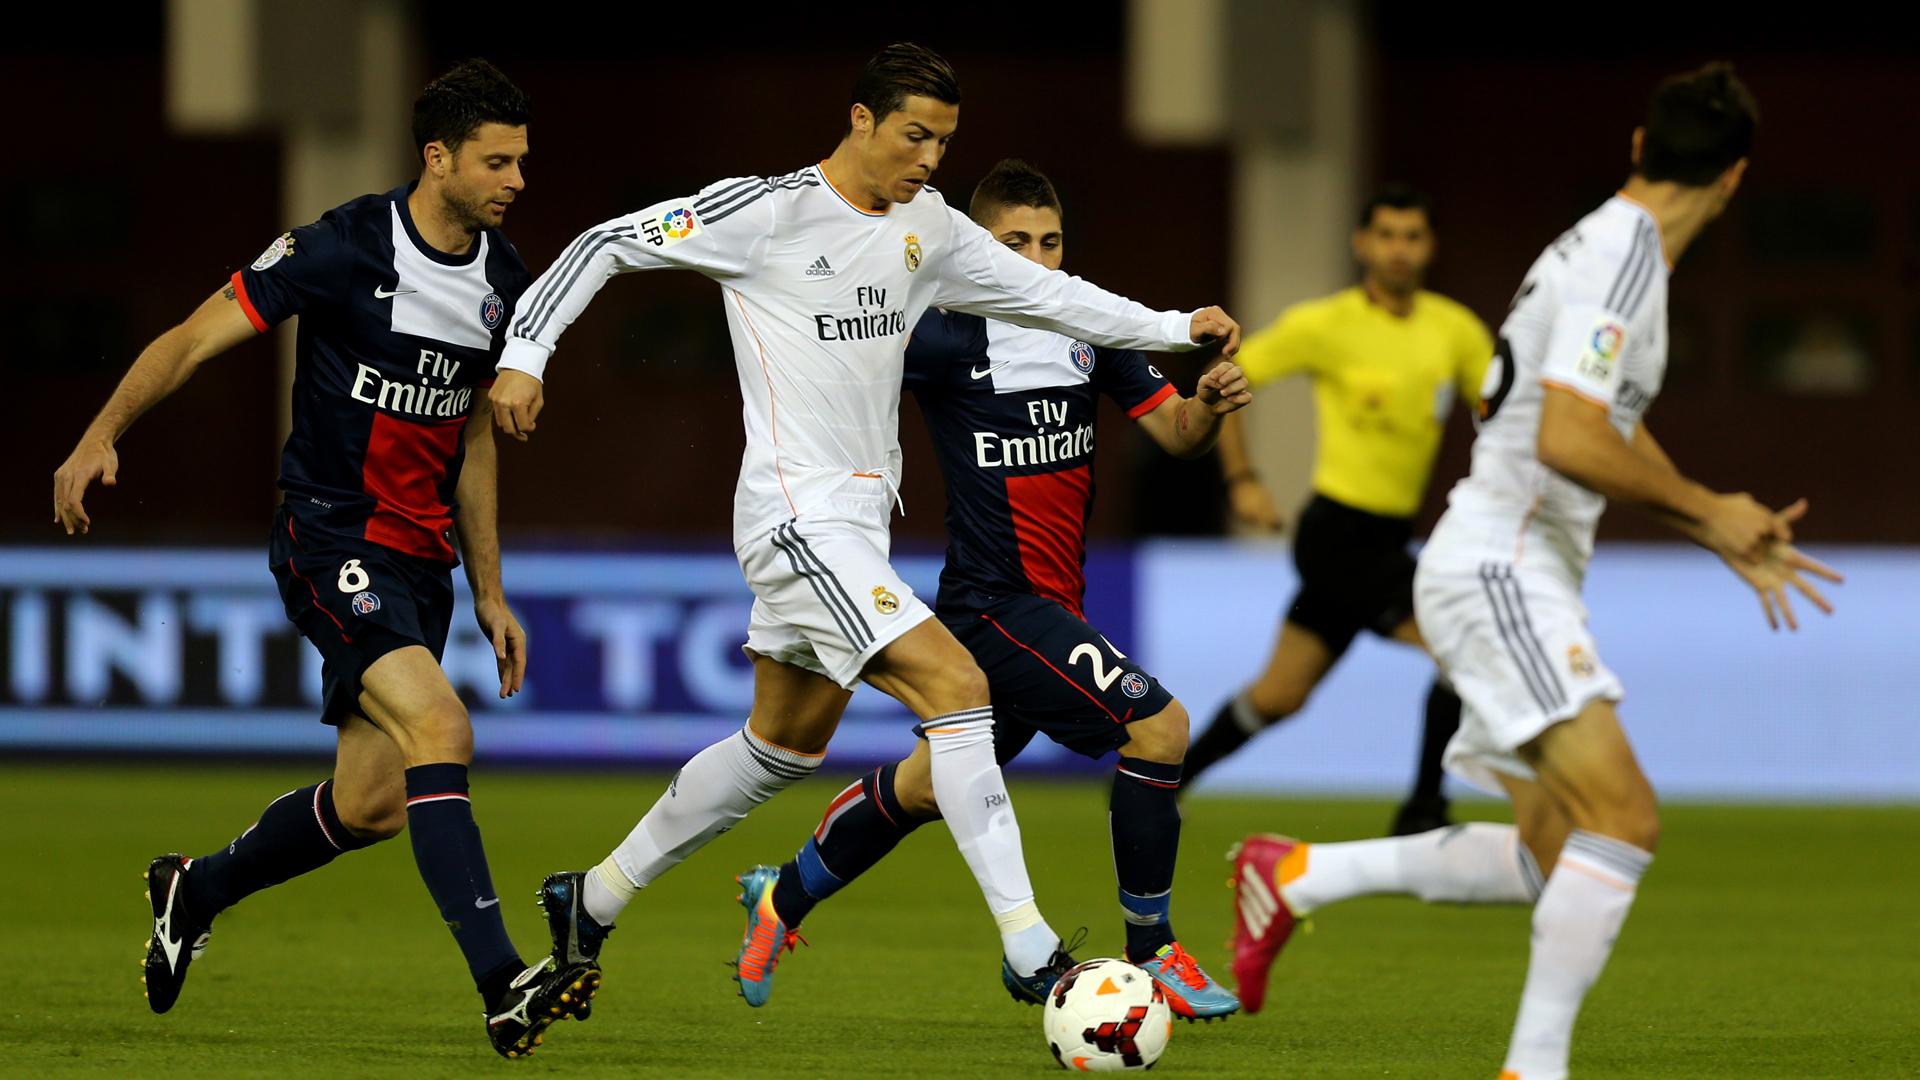 Image Result For Vivo Apoel Vs Real Madrid En Vivo Champions League